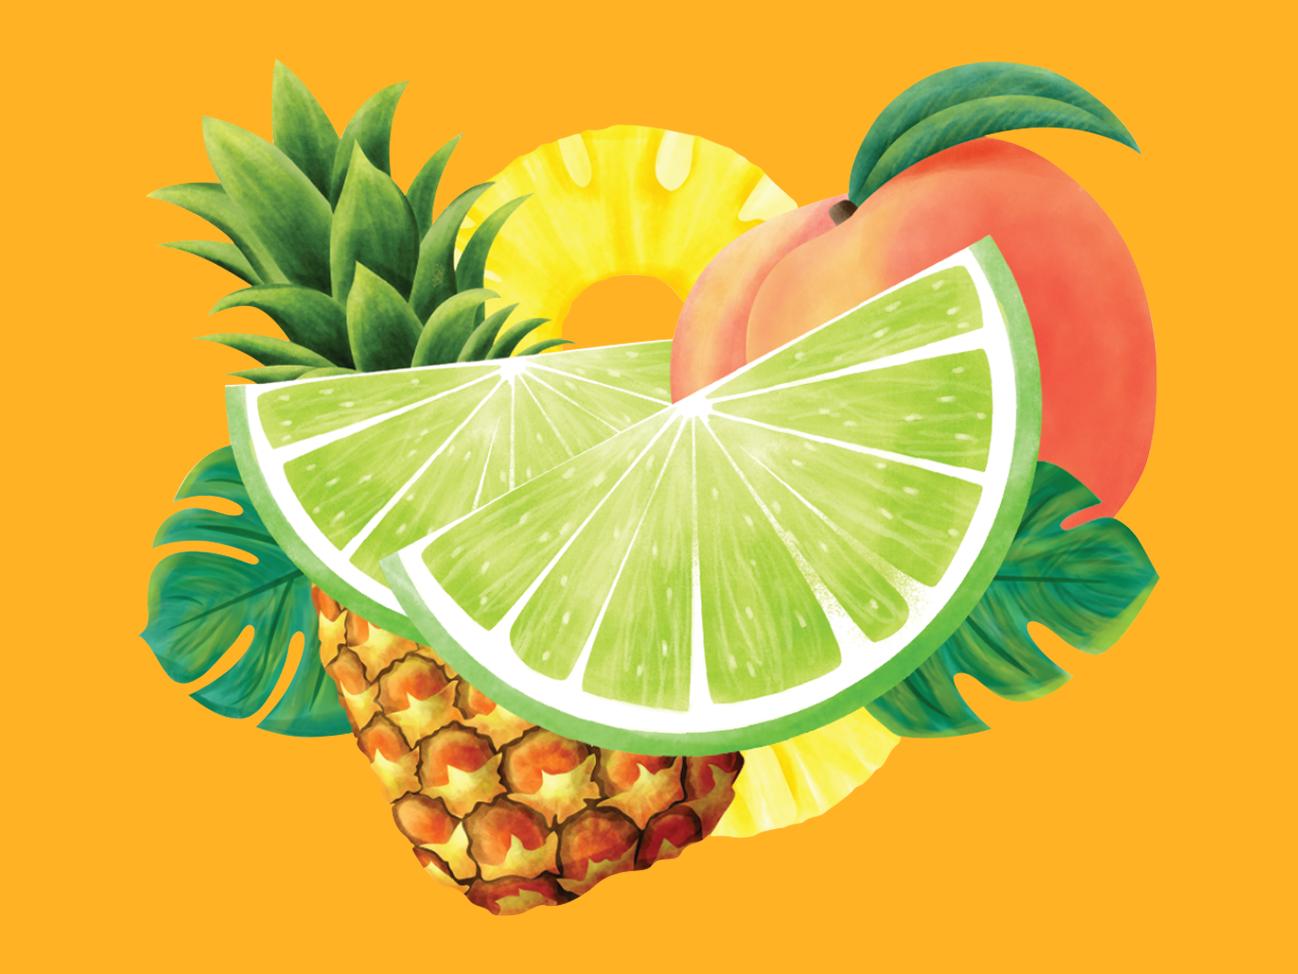 Limeadeillustration